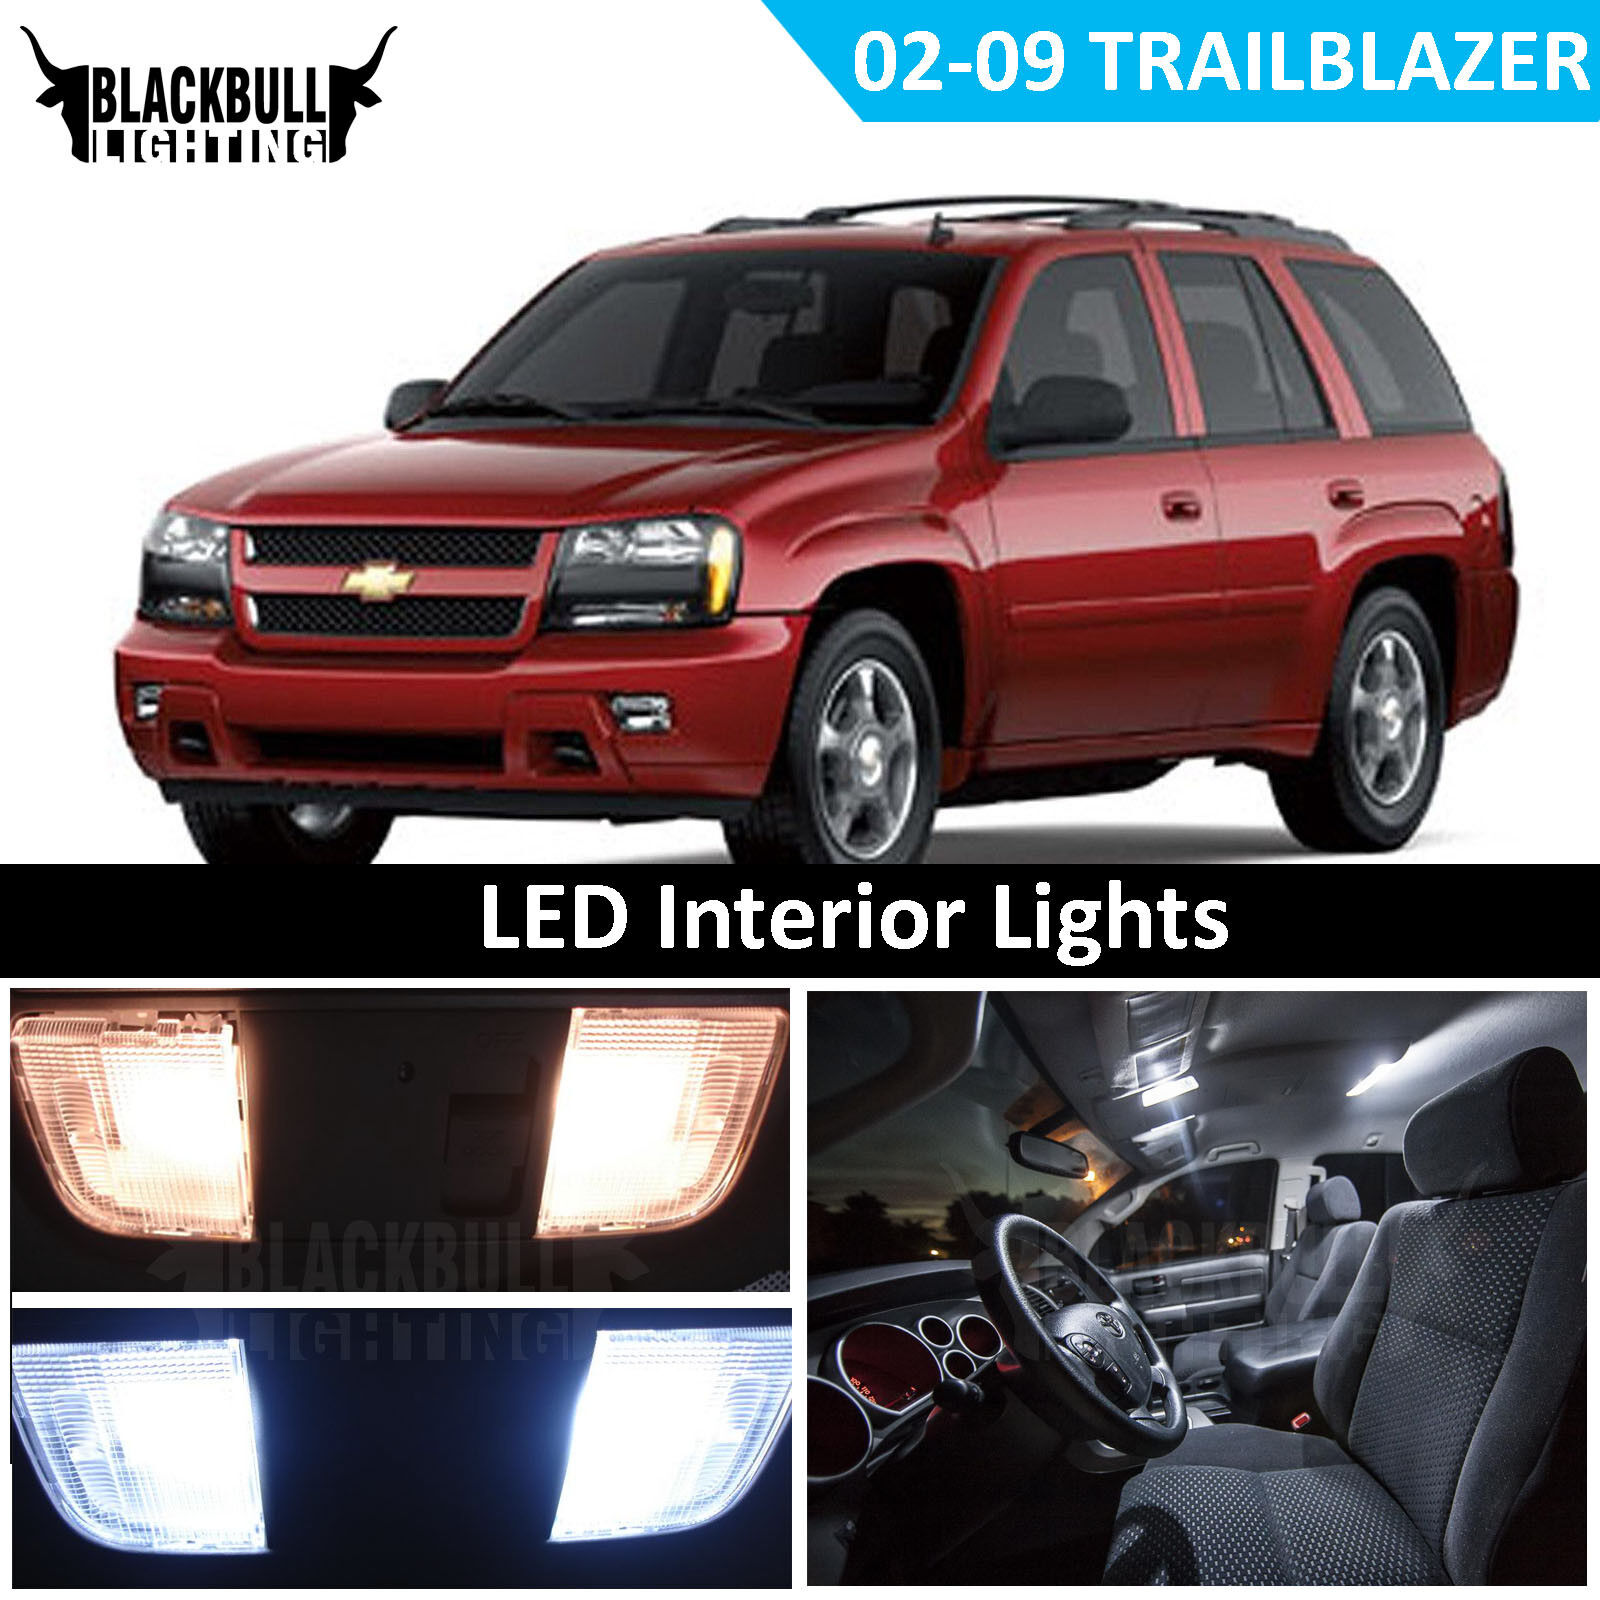 WHITE LED Interior Lights Replacement 16 Bulb Kit for 02-09 Chevy Trailblazer